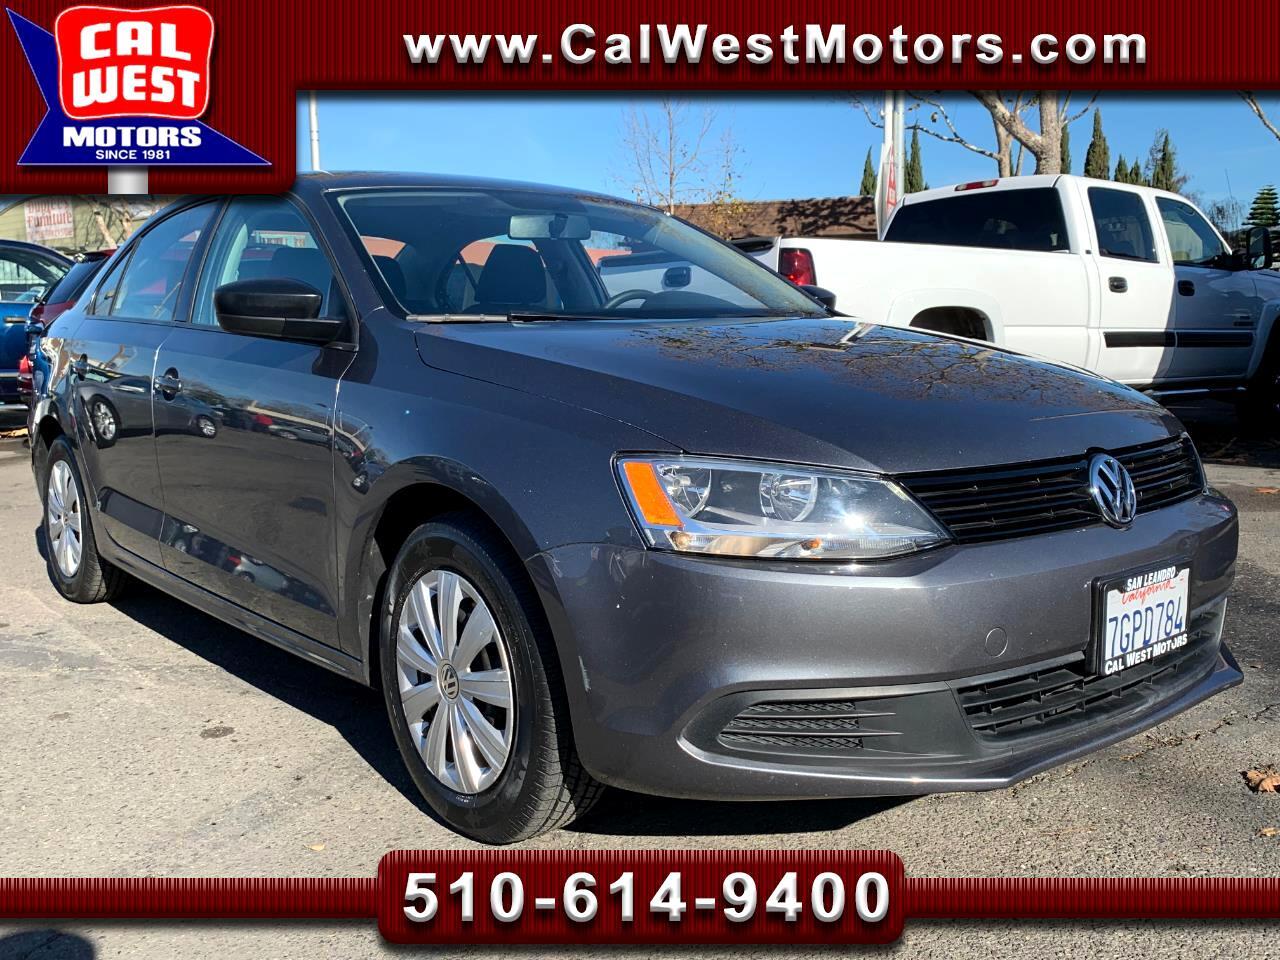 2014 Volkswagen Jetta Sedan Auto AC LowMiles 1Owner  VeryClean WellMntnd